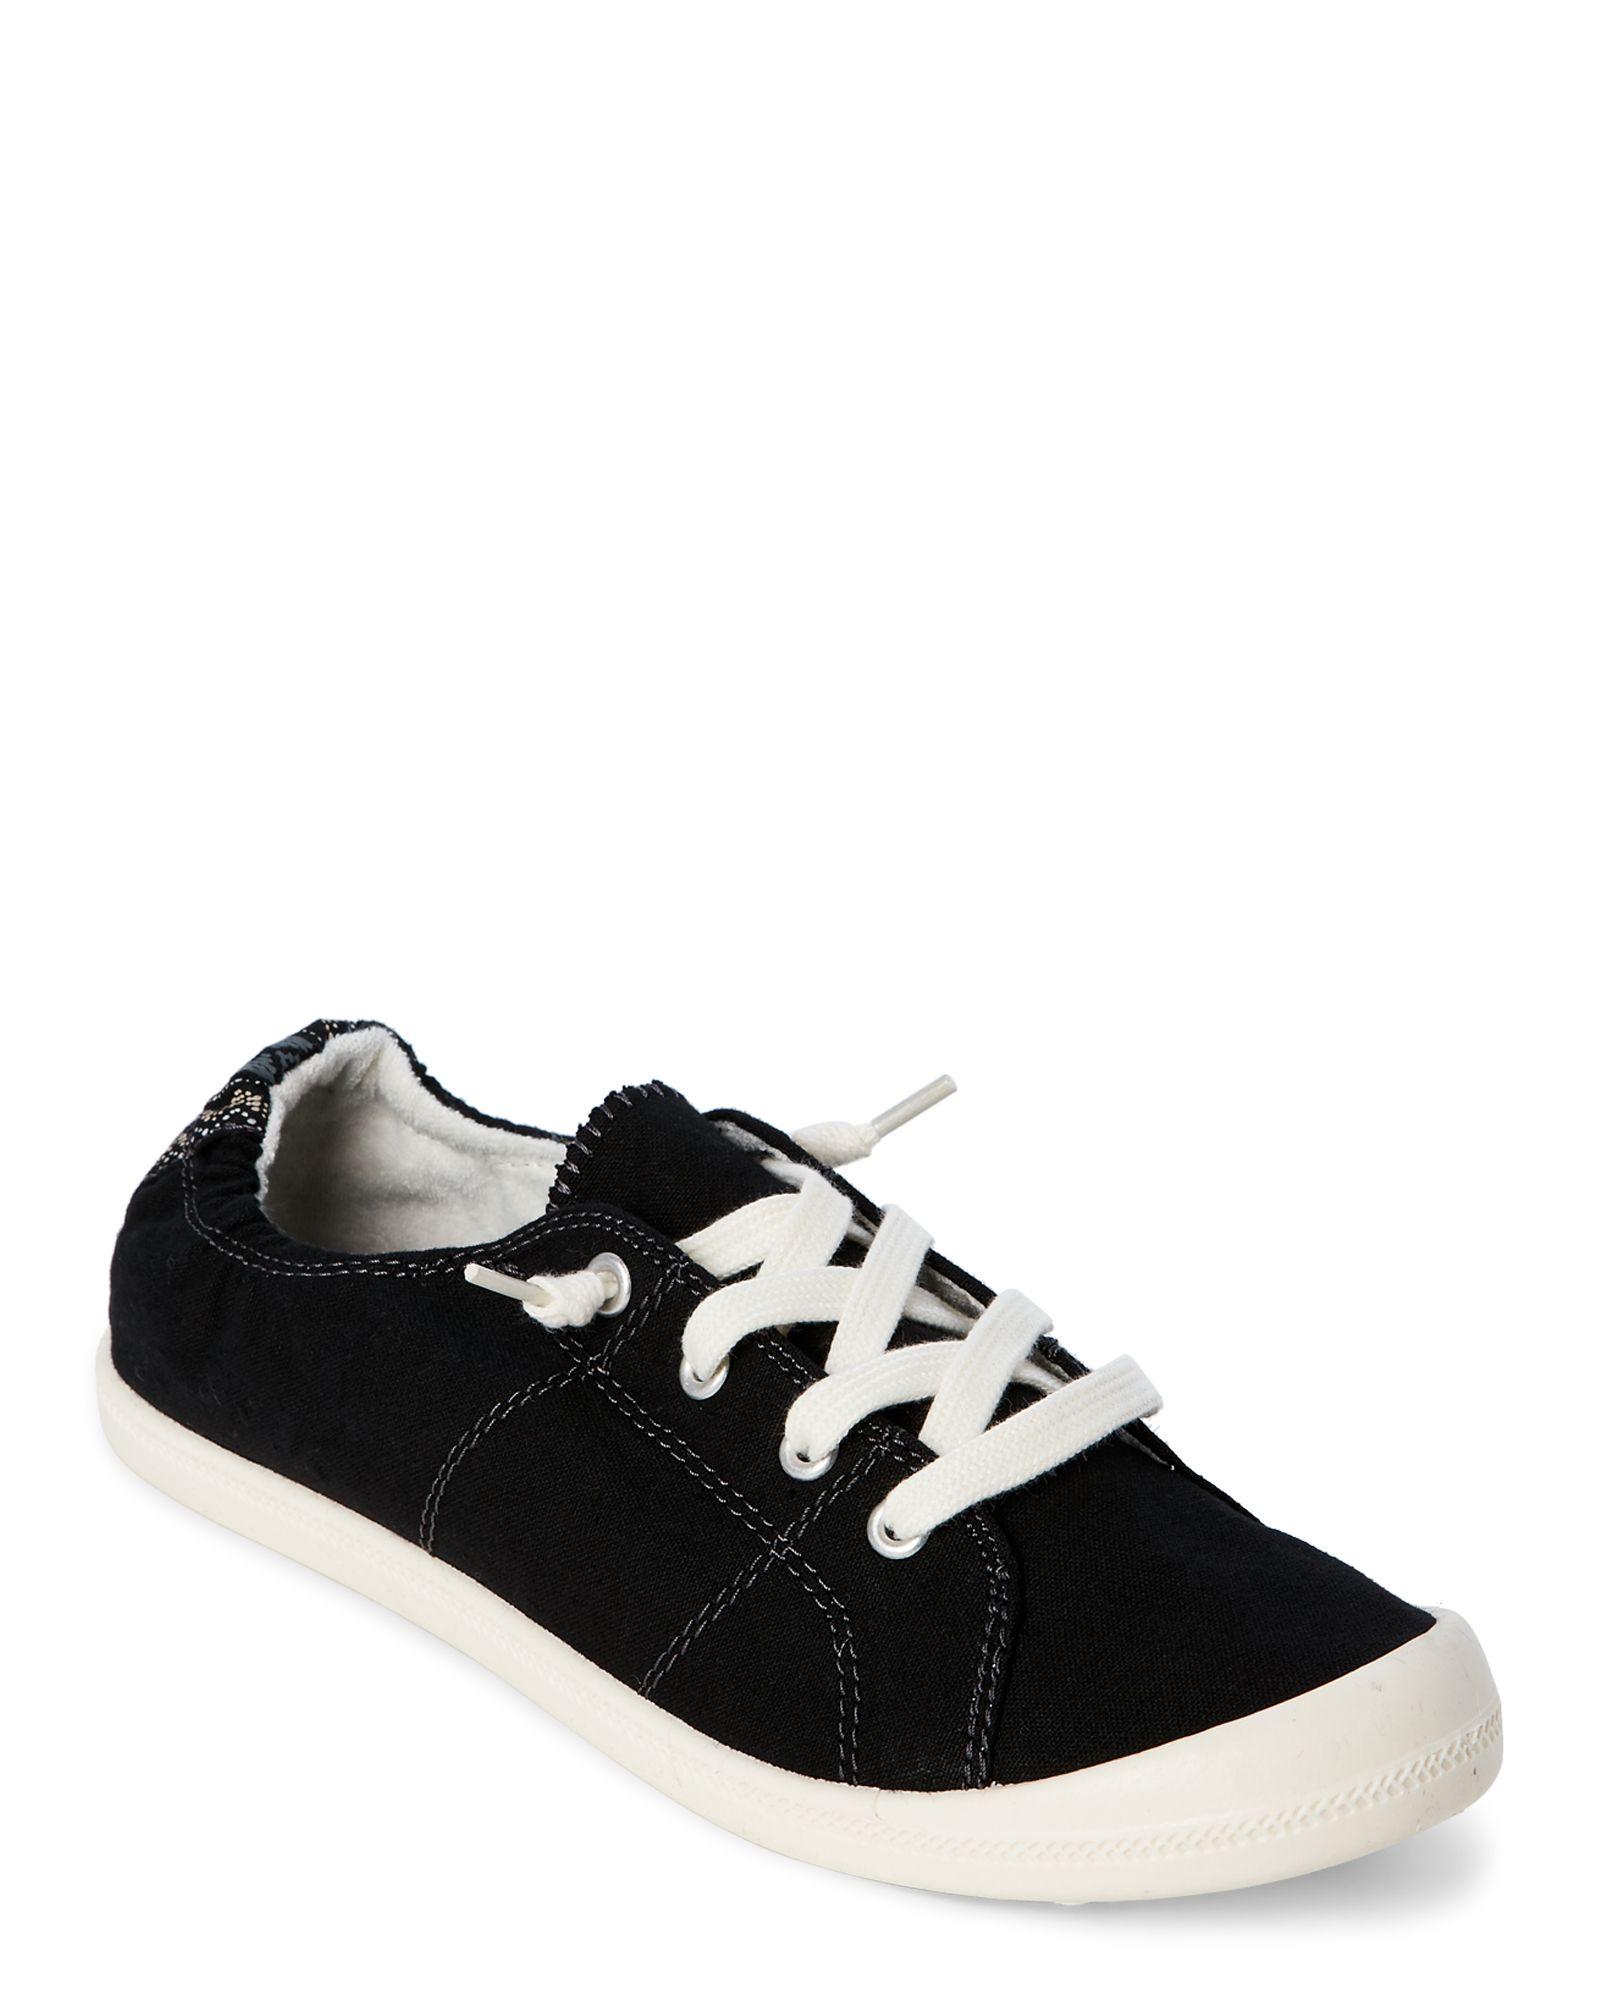 Black Bailey Slip-On Sneakers | Slip on